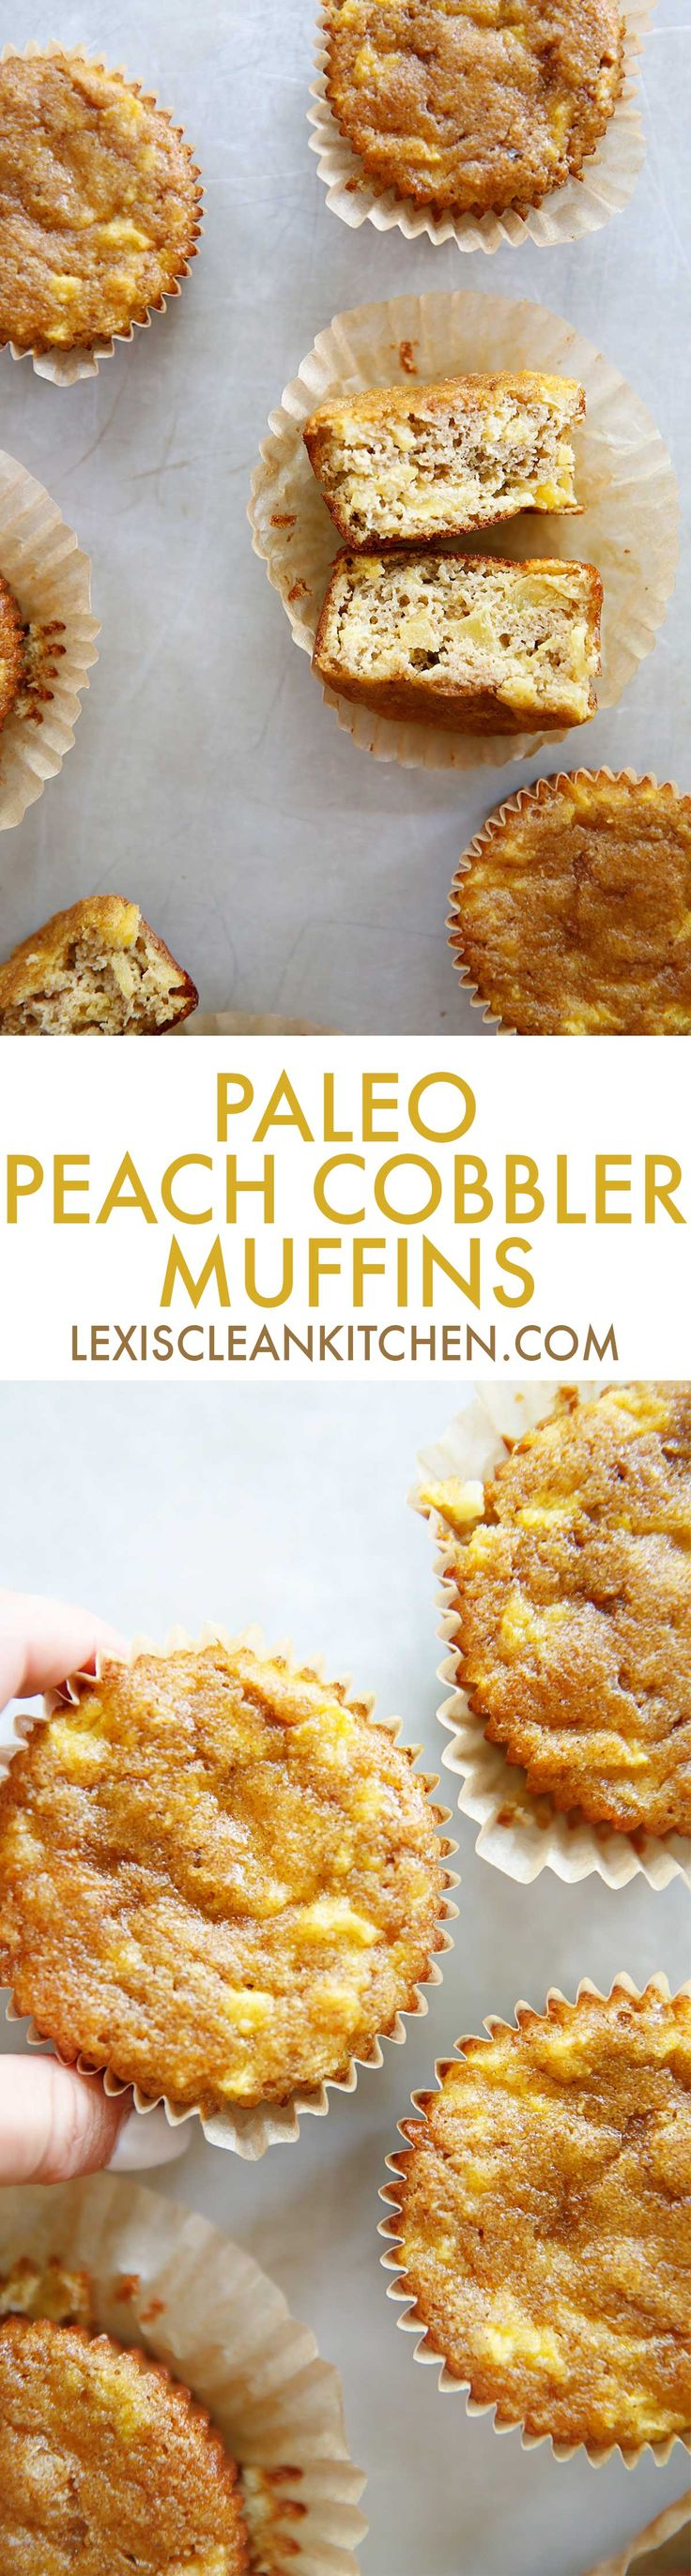 Peach Cobbler Muffins | Lexi's Clean Kitchen